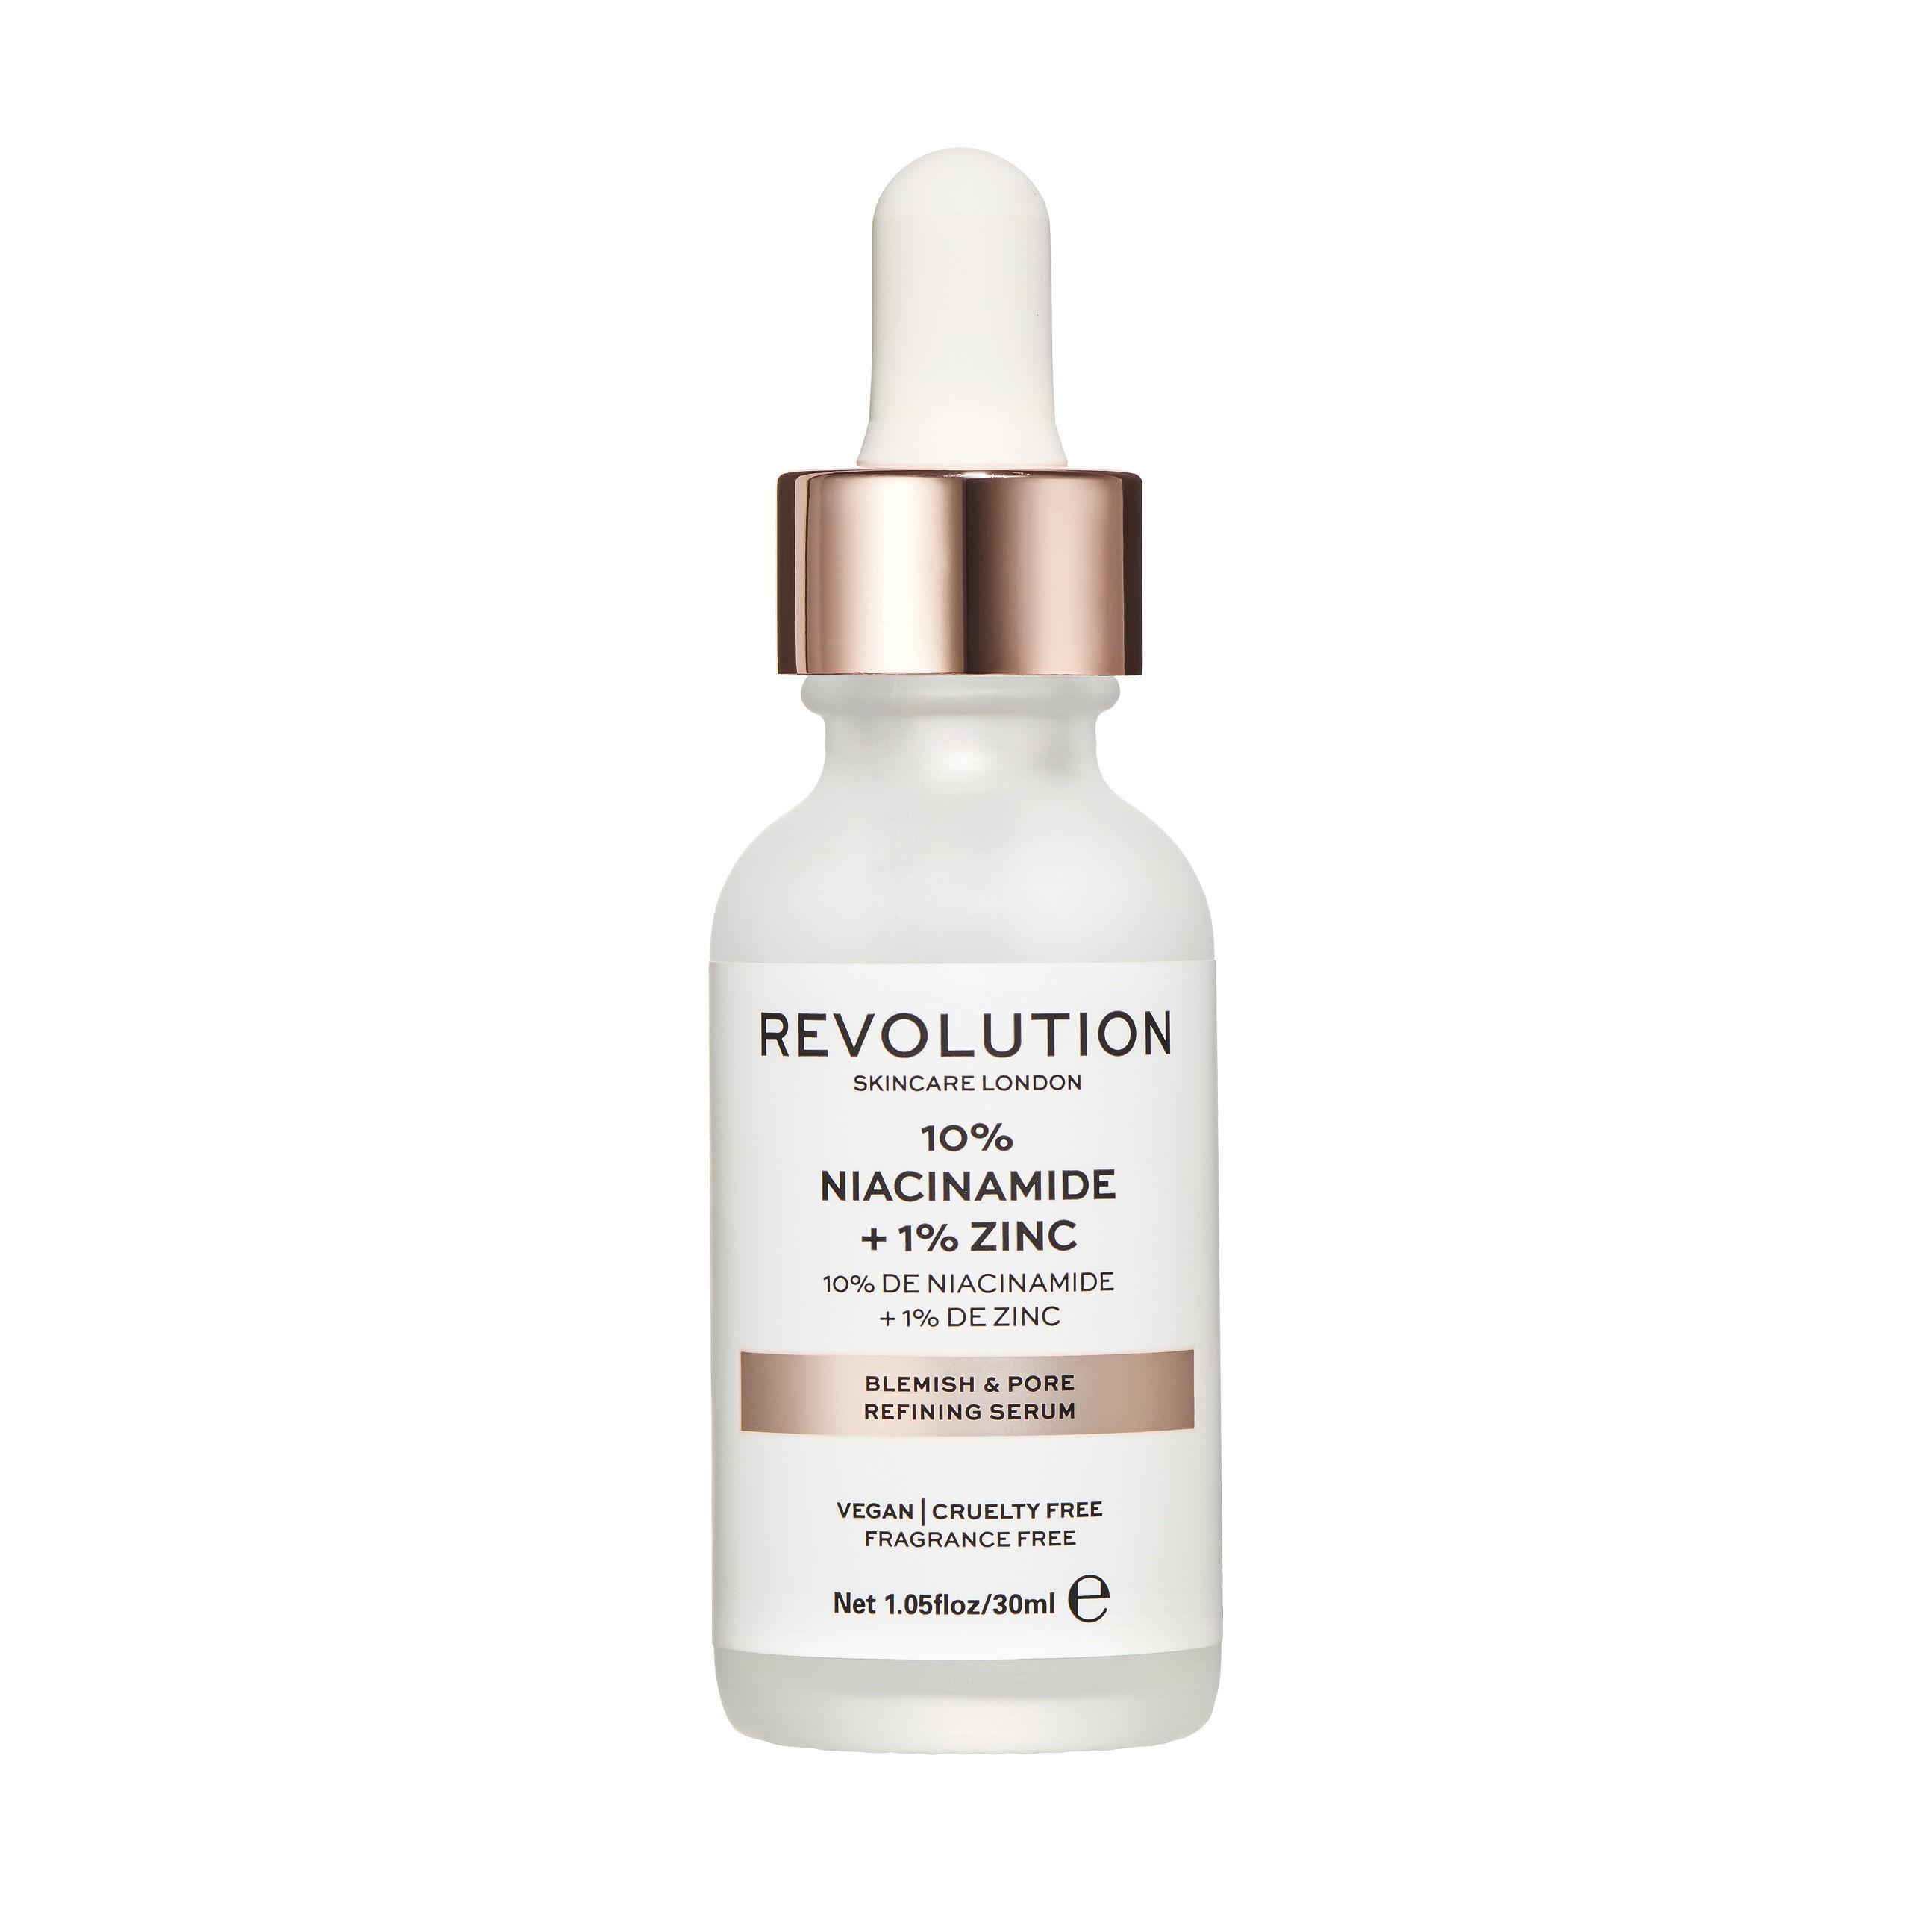 Makeup Revolution Skincare Blemish and Pore Refining Serum - 10% Niacinamide + 1% Zinc(30ml)